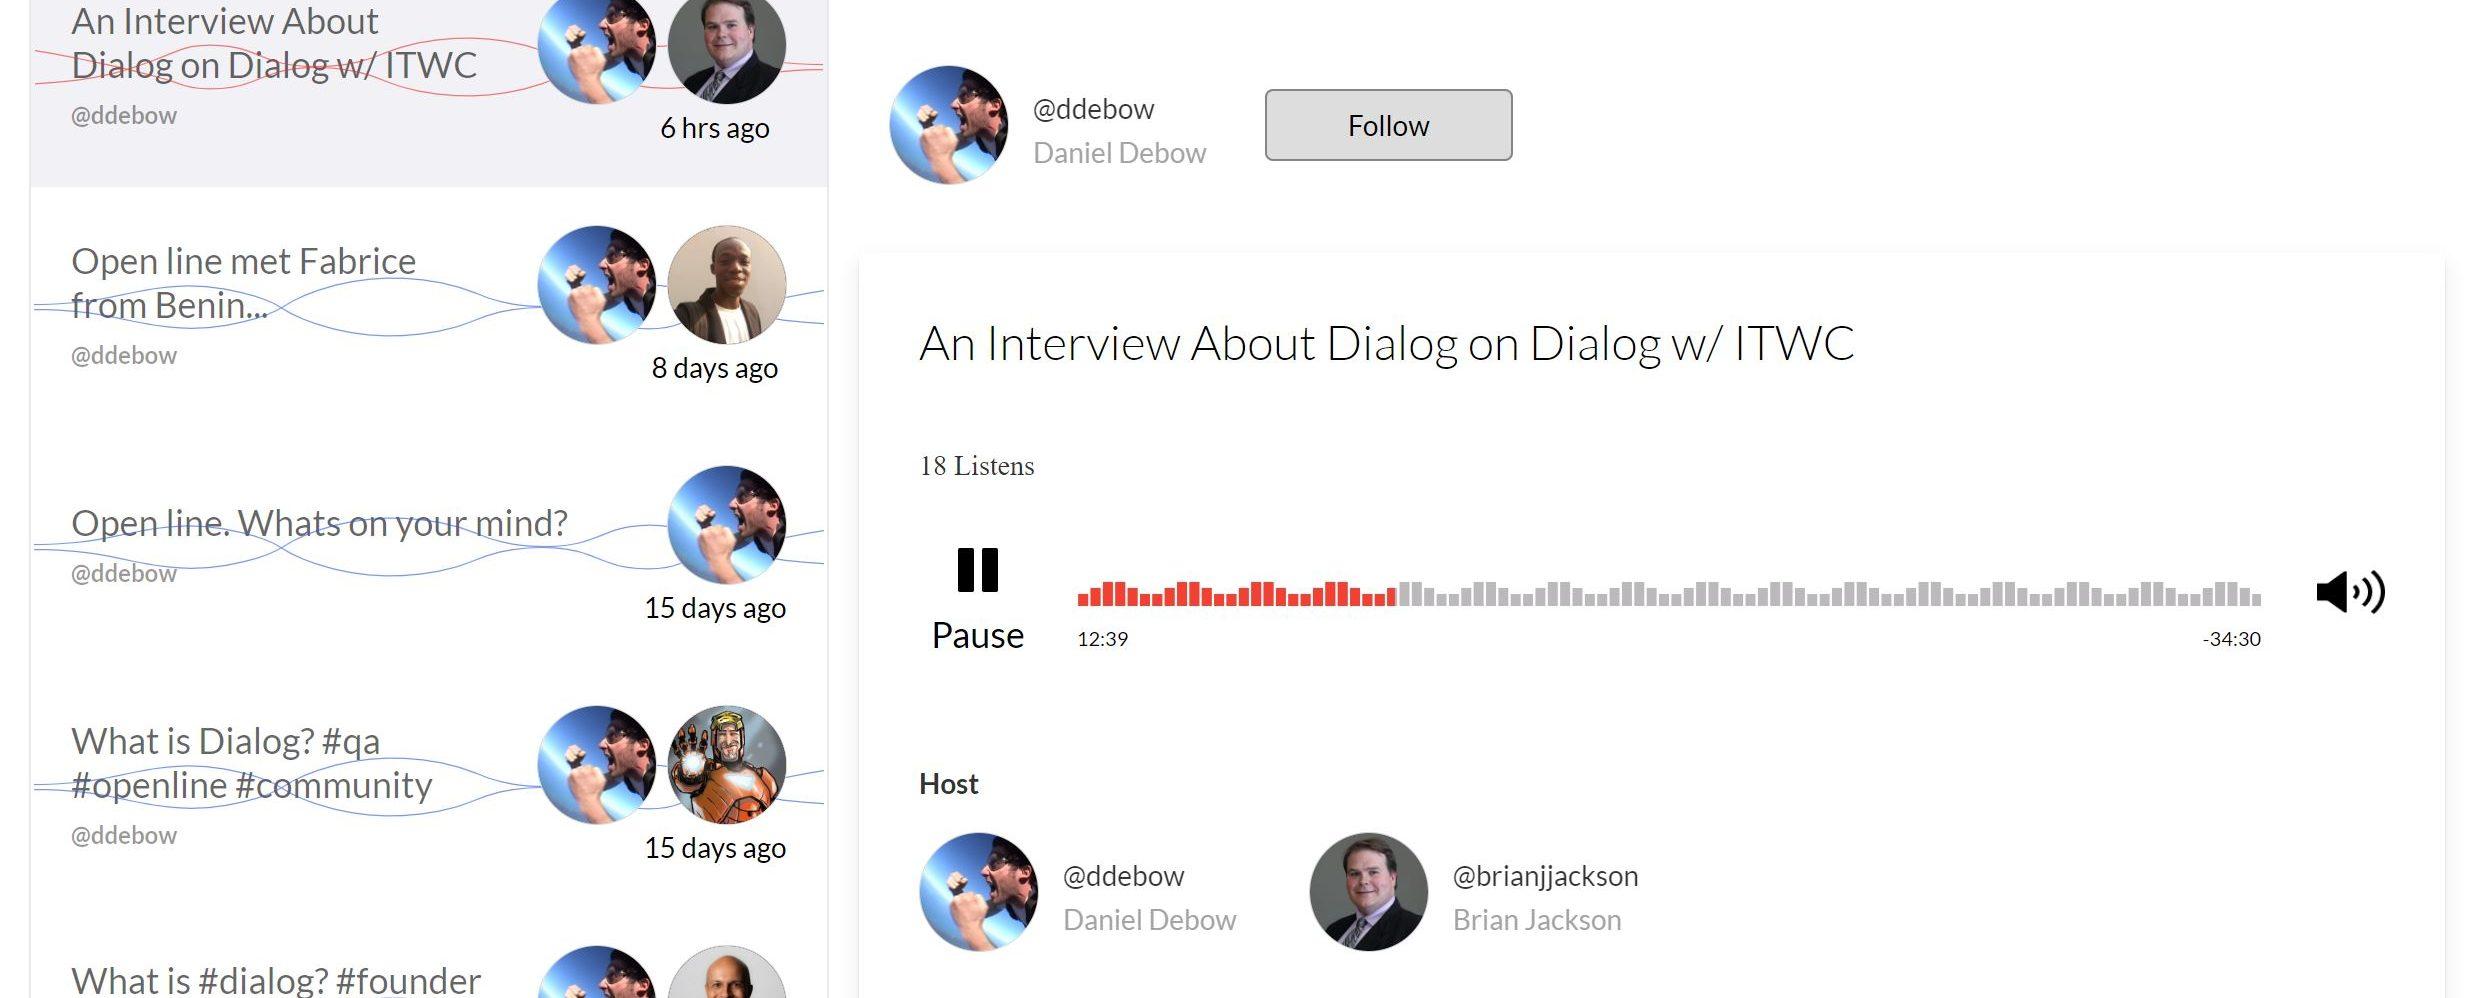 Dialog - Daniel Debow and Brian Jackson